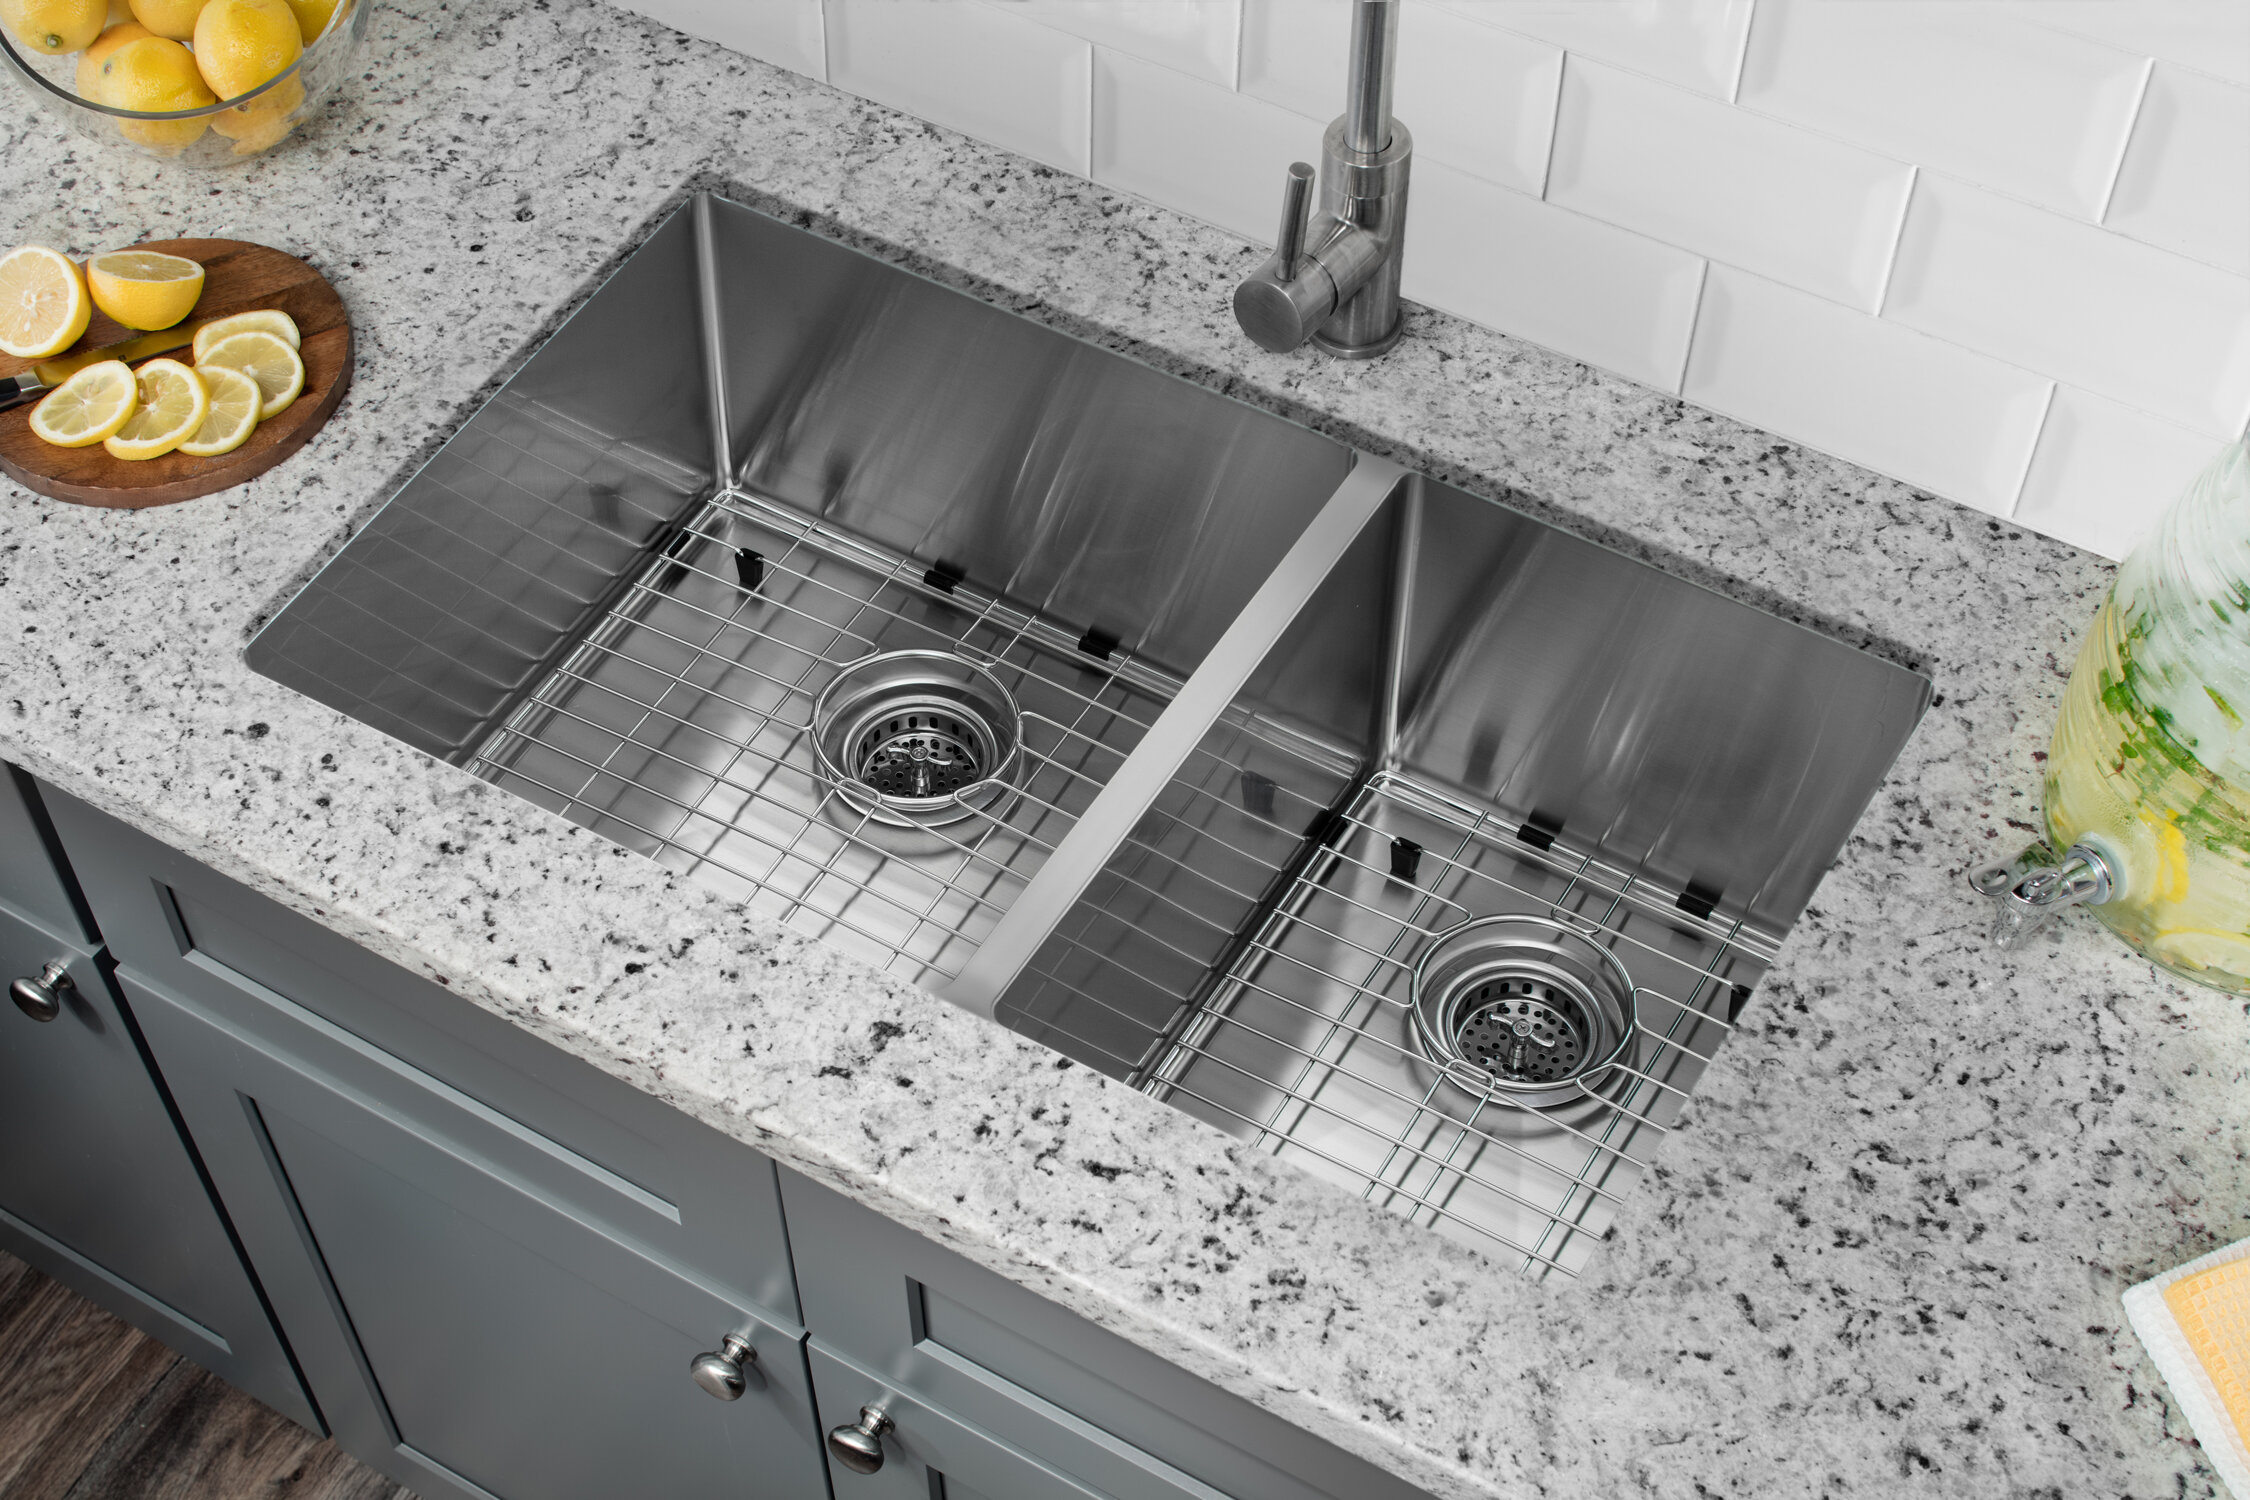 Radius 16 Gauge Stainless Steel 32\'\' x 19\'\' 60/40 Double Bowl Undermount  Kitchen Sink